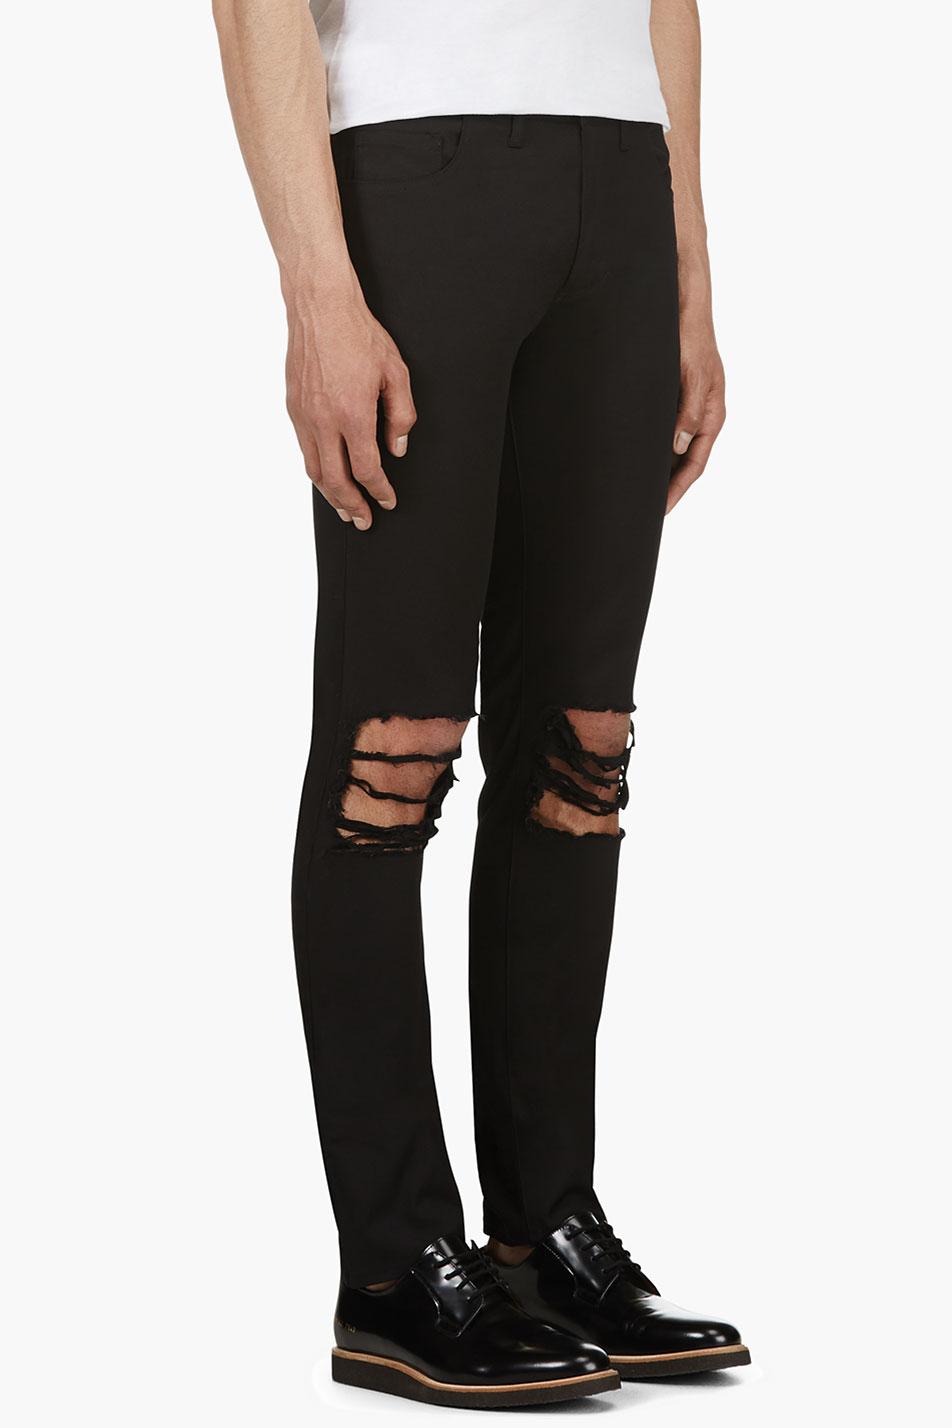 Christian dada Black Distressed Skinny Jeans in Black for Men | Lyst